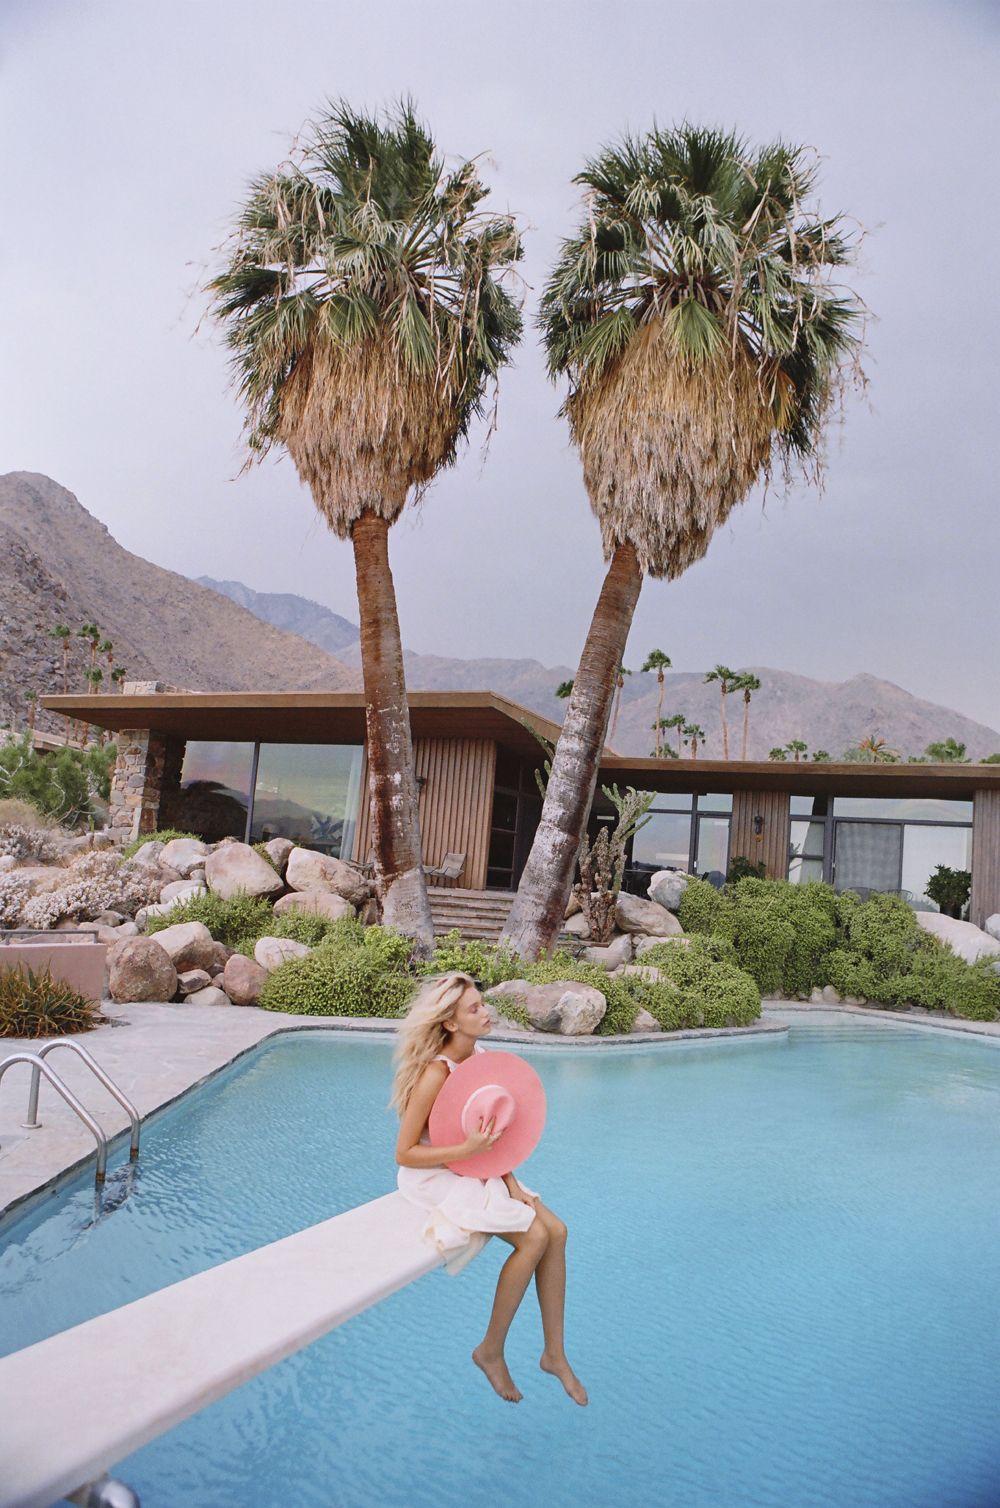 Lack of Color hats, 'Las Palmas' Summer 2016 Collection Cailin wears Montana Sunset Palms Shot by Jason Lee Parry